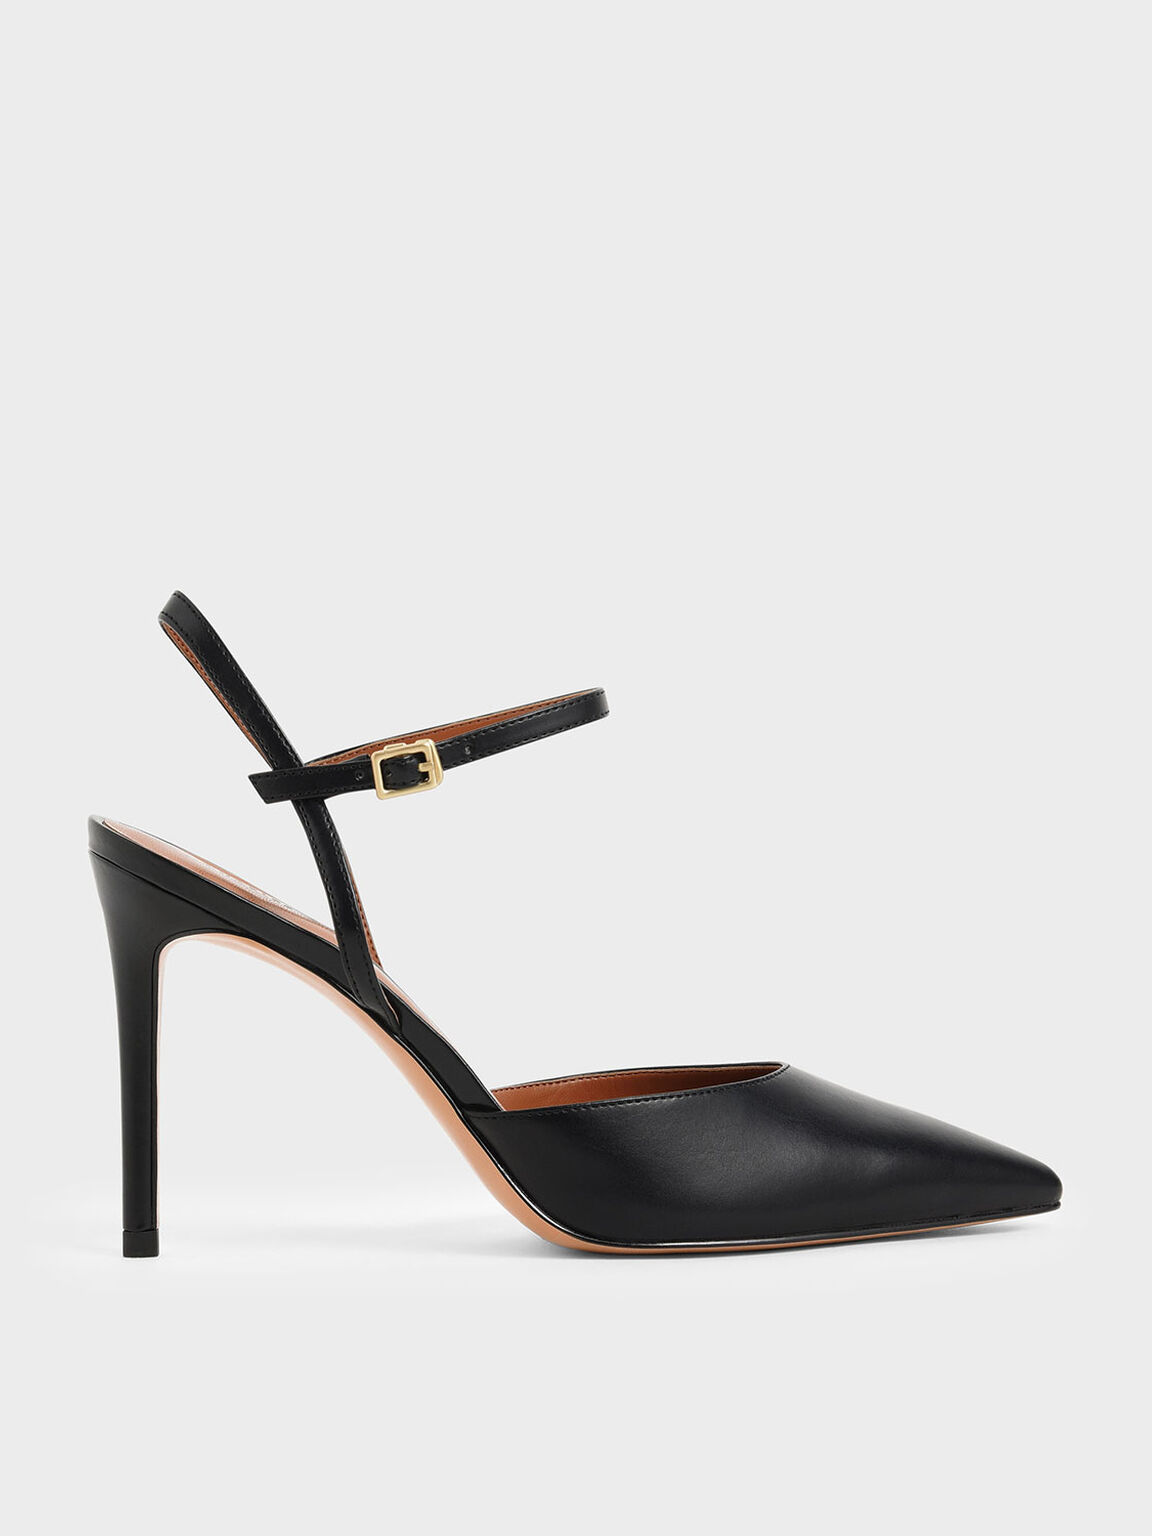 Pointed Toe Ankle Strap Pumps, Black, hi-res